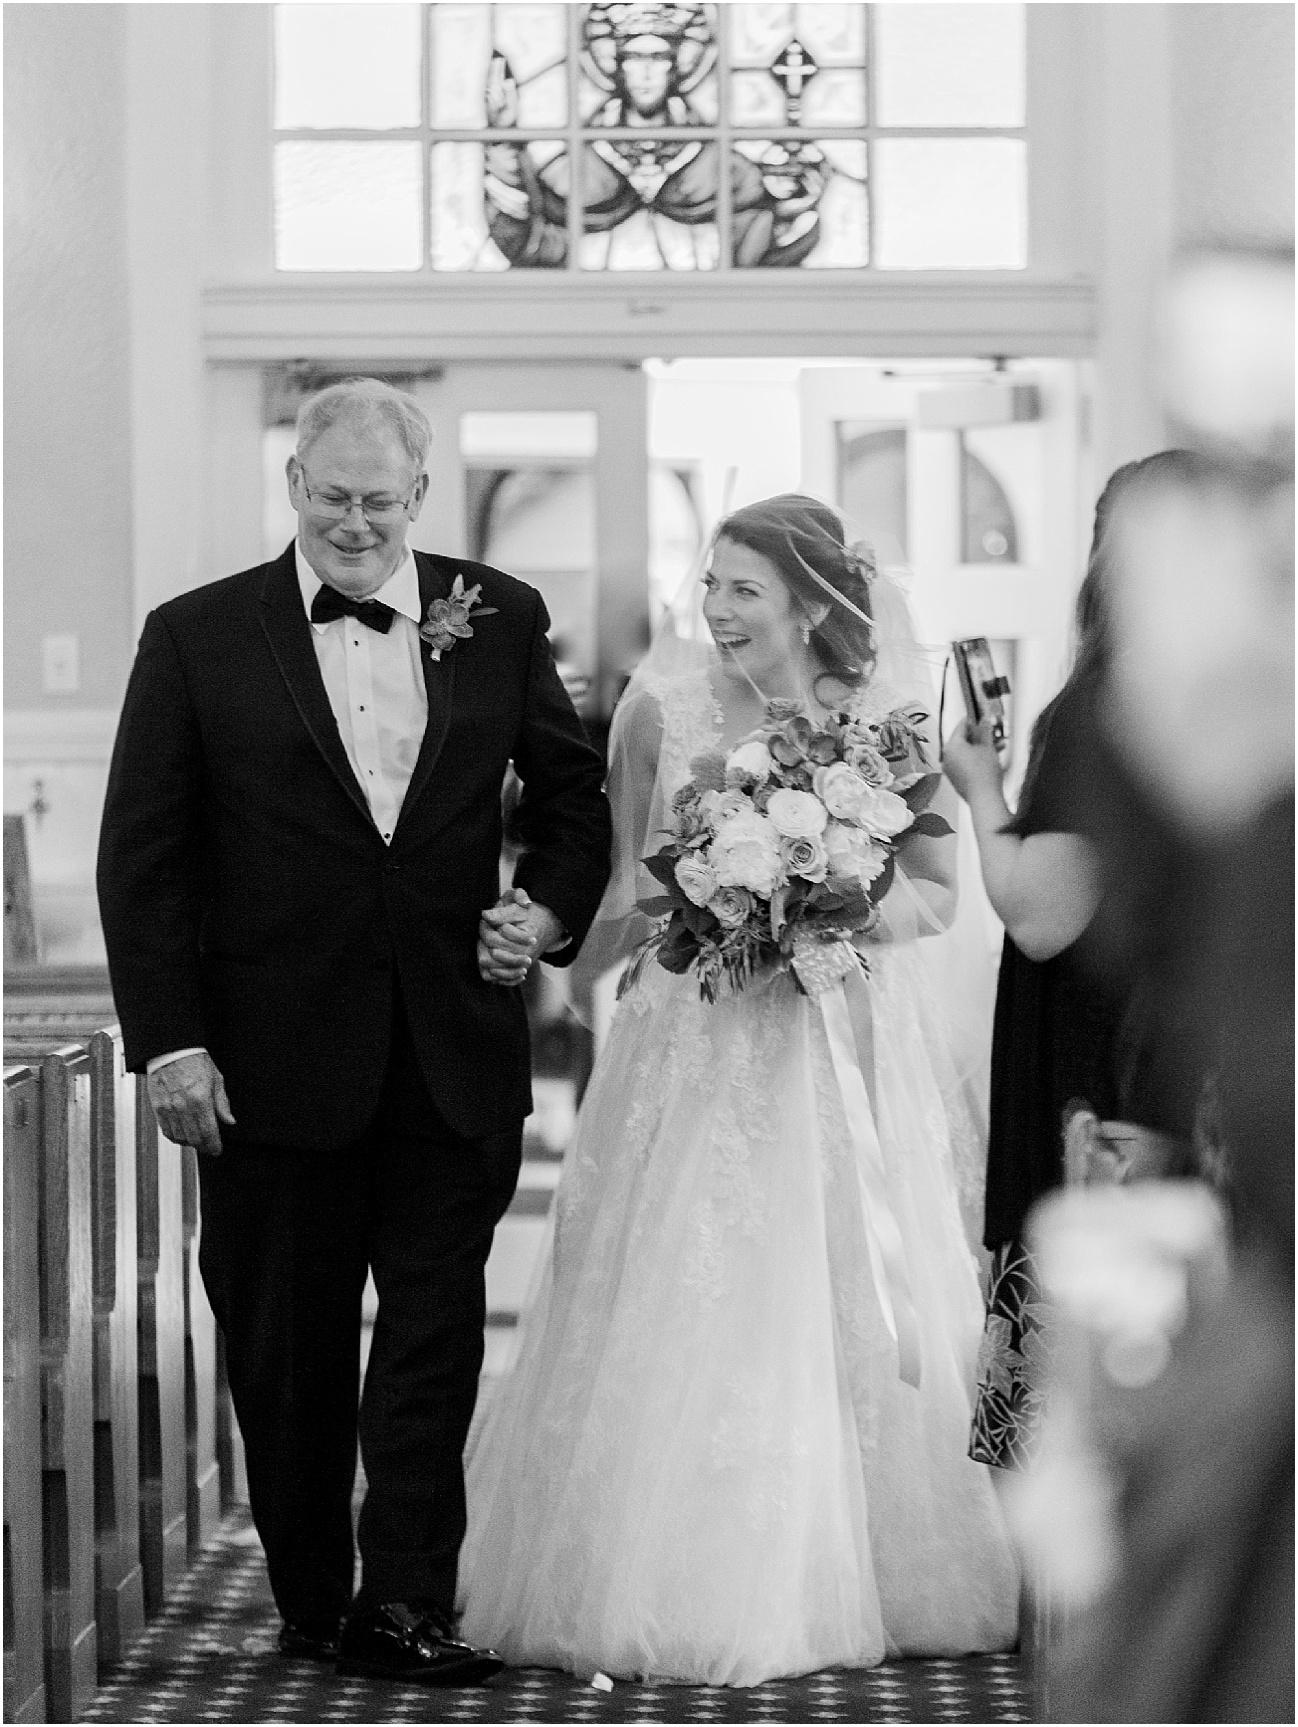 courtney_kurt_cape_cod_popponessett_inn_dowses_beach_boston_wedding_meredith_jane_photography_photo_0033.jpg